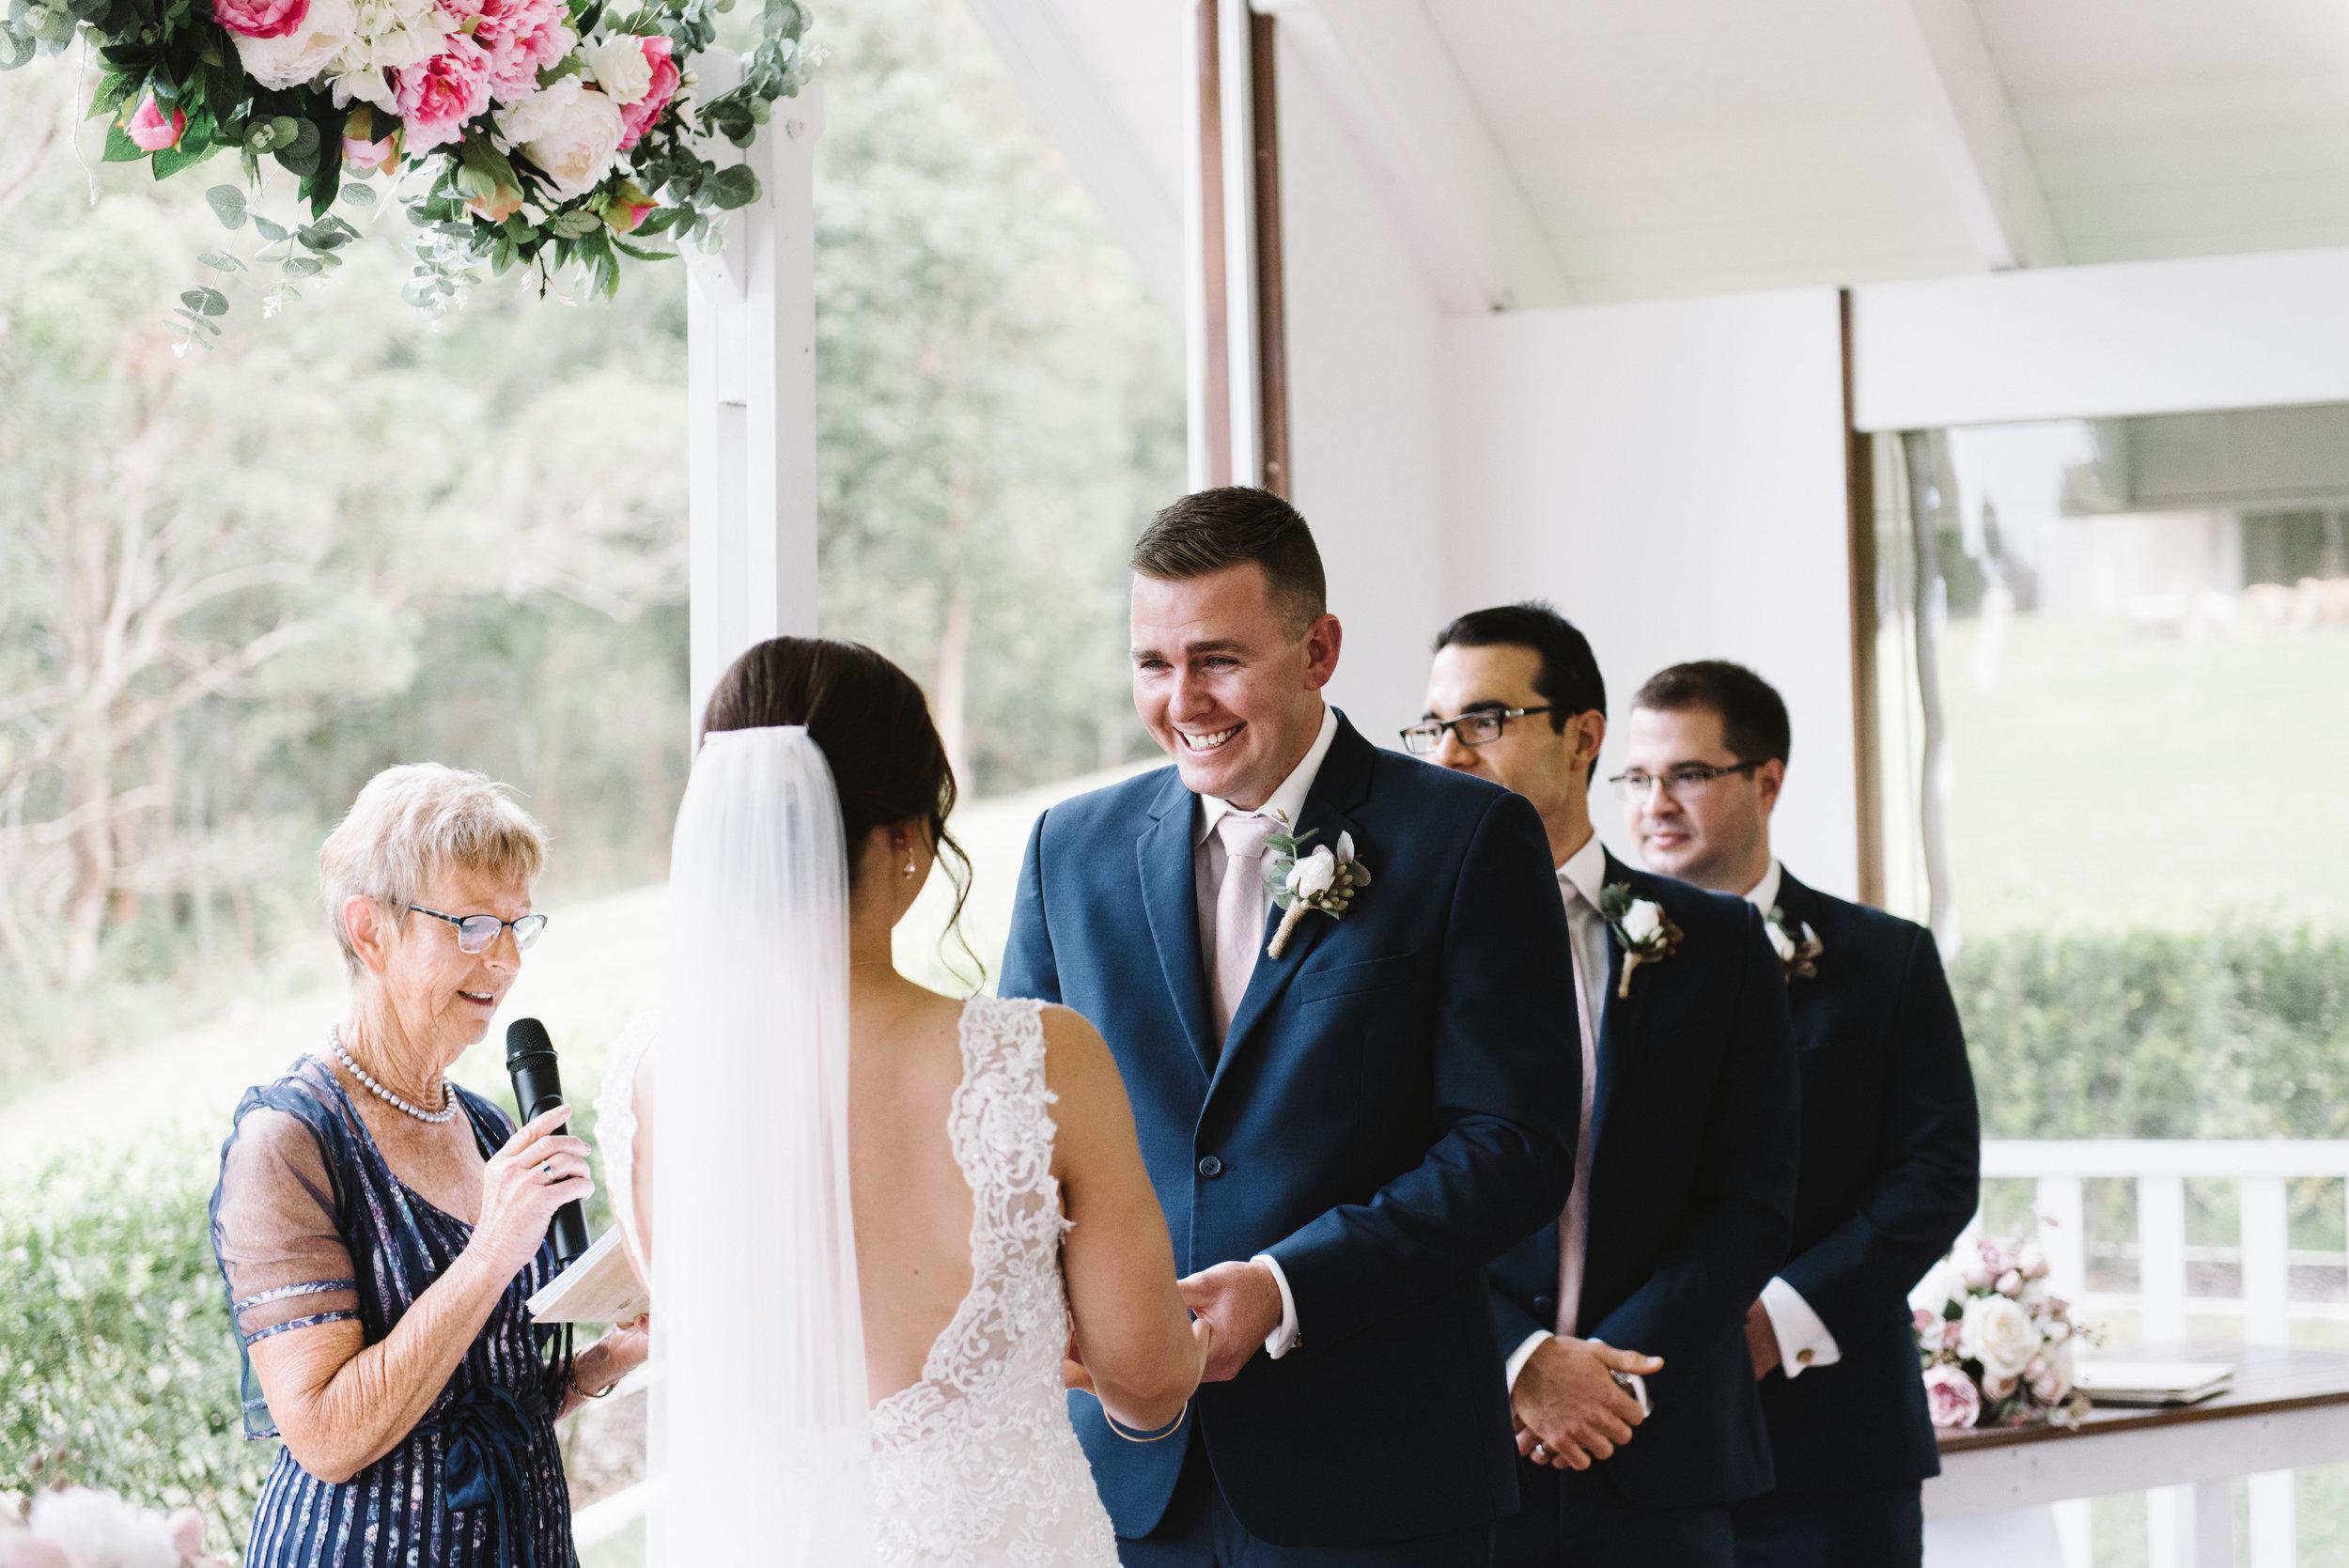 LAURENOLIVIA-austinvilla-estate-wedding-45.jpg